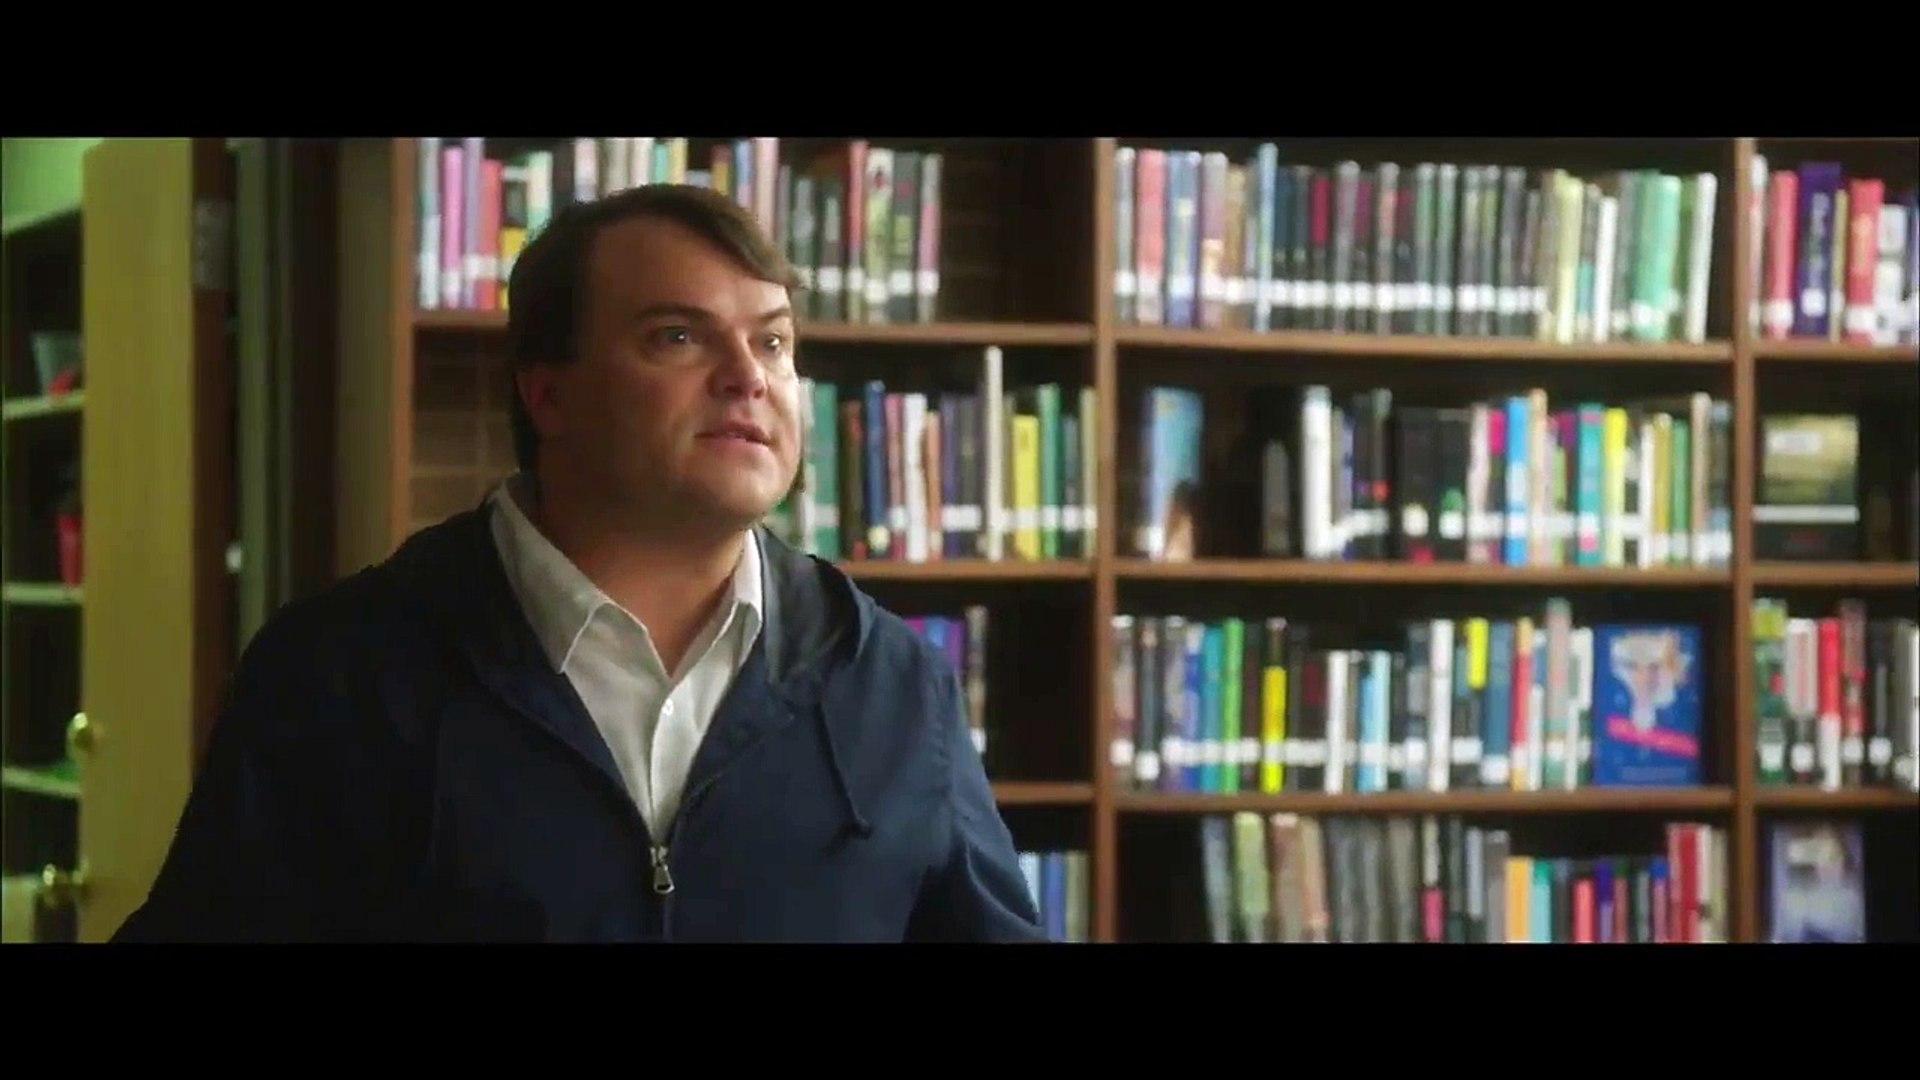 The D Train Official Trailer #1 (2015) - Jack Black, James Marsden Movie